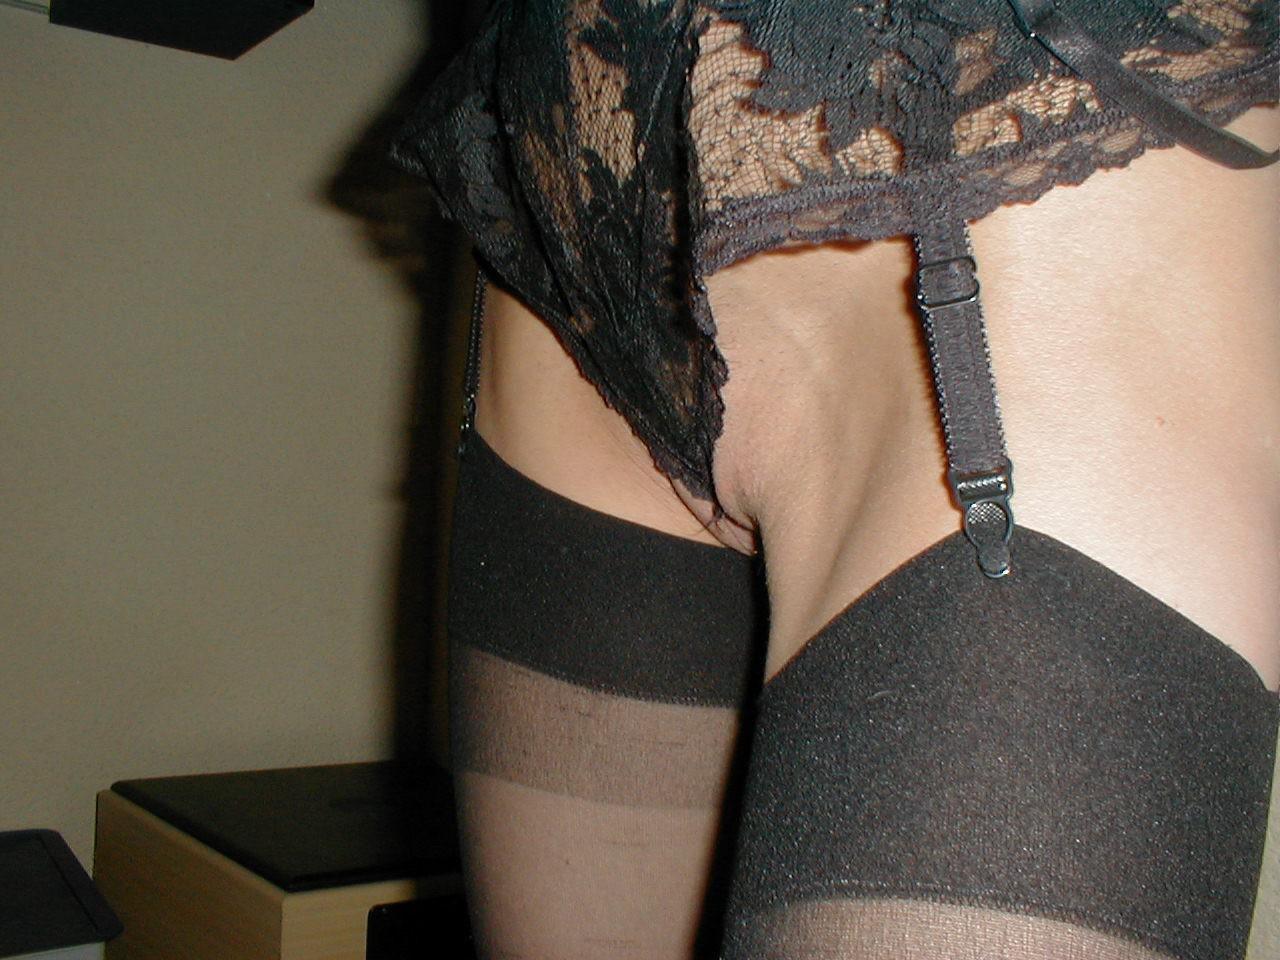 http://pbs-2.adult-empire.com/85/8570/020/pic/8.jpg